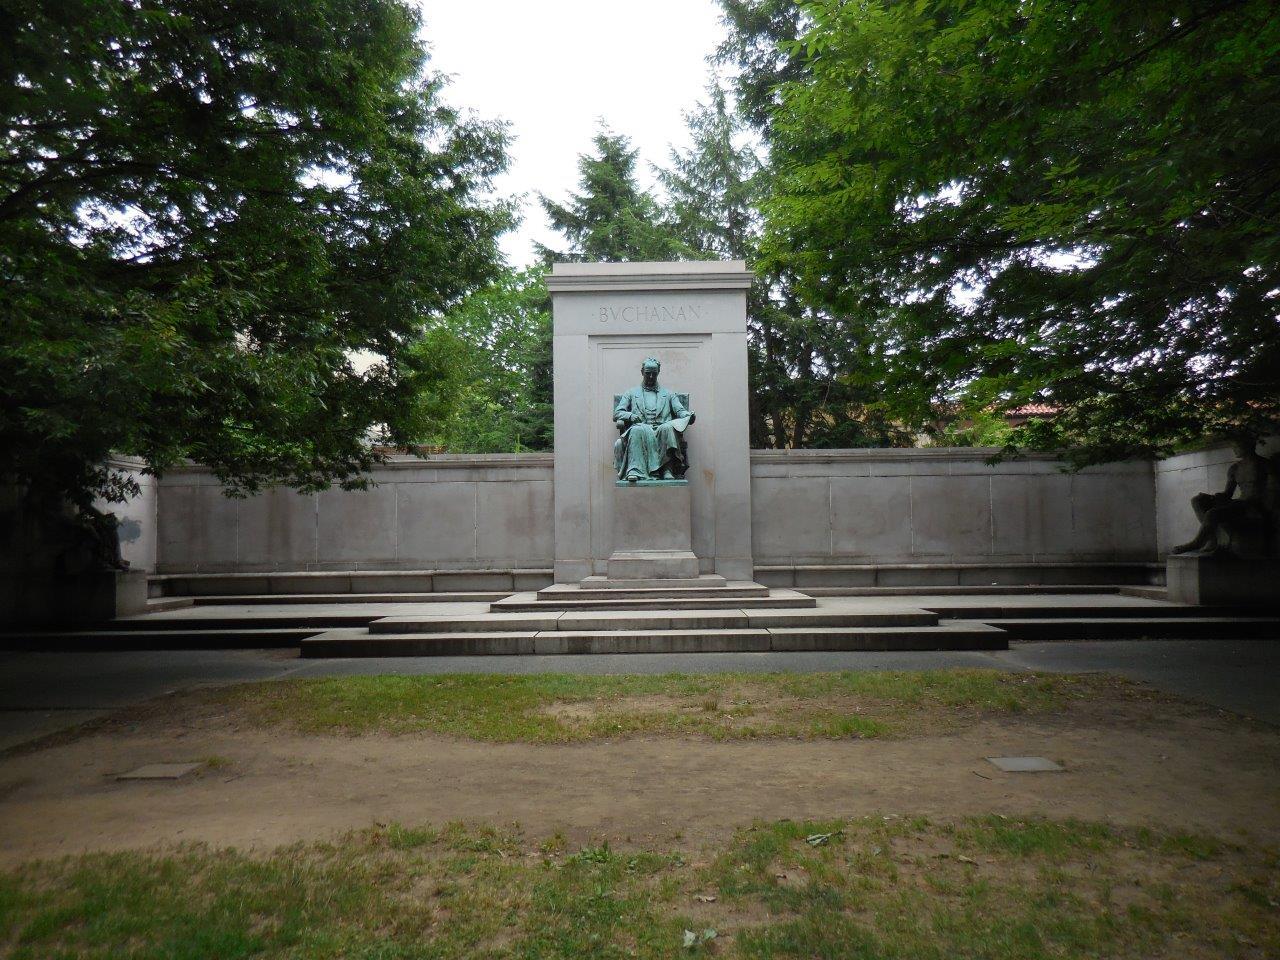 James Buchanan statue in Washington, D.C.